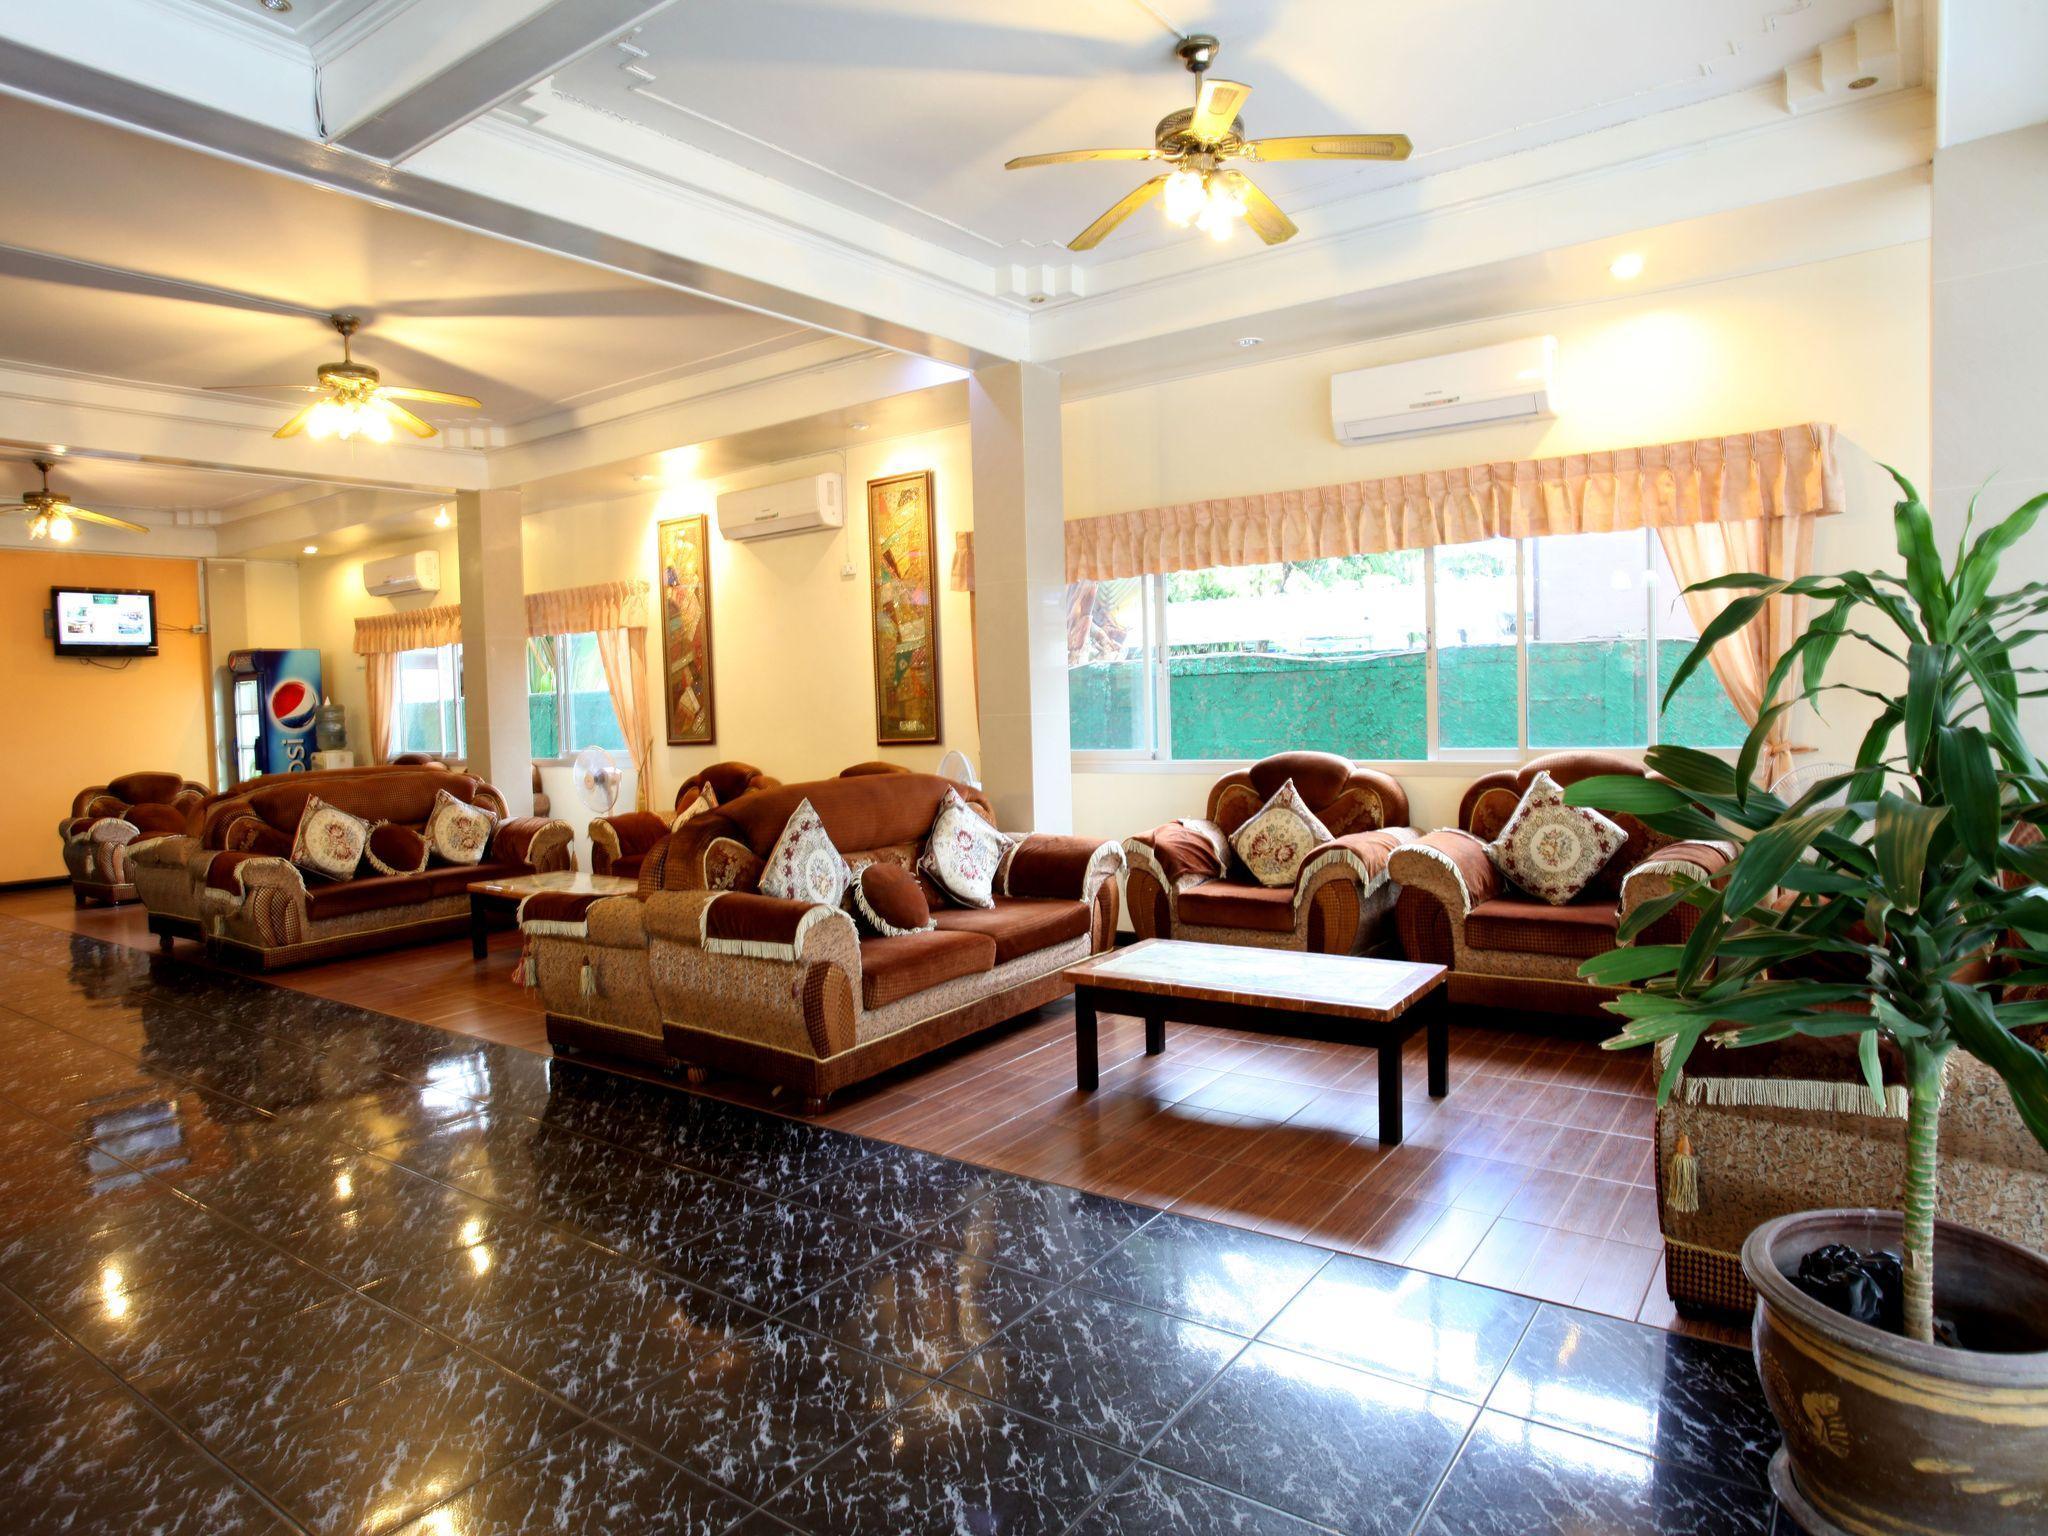 Home pattaya hotel โรงแรมโฮม พัทยา